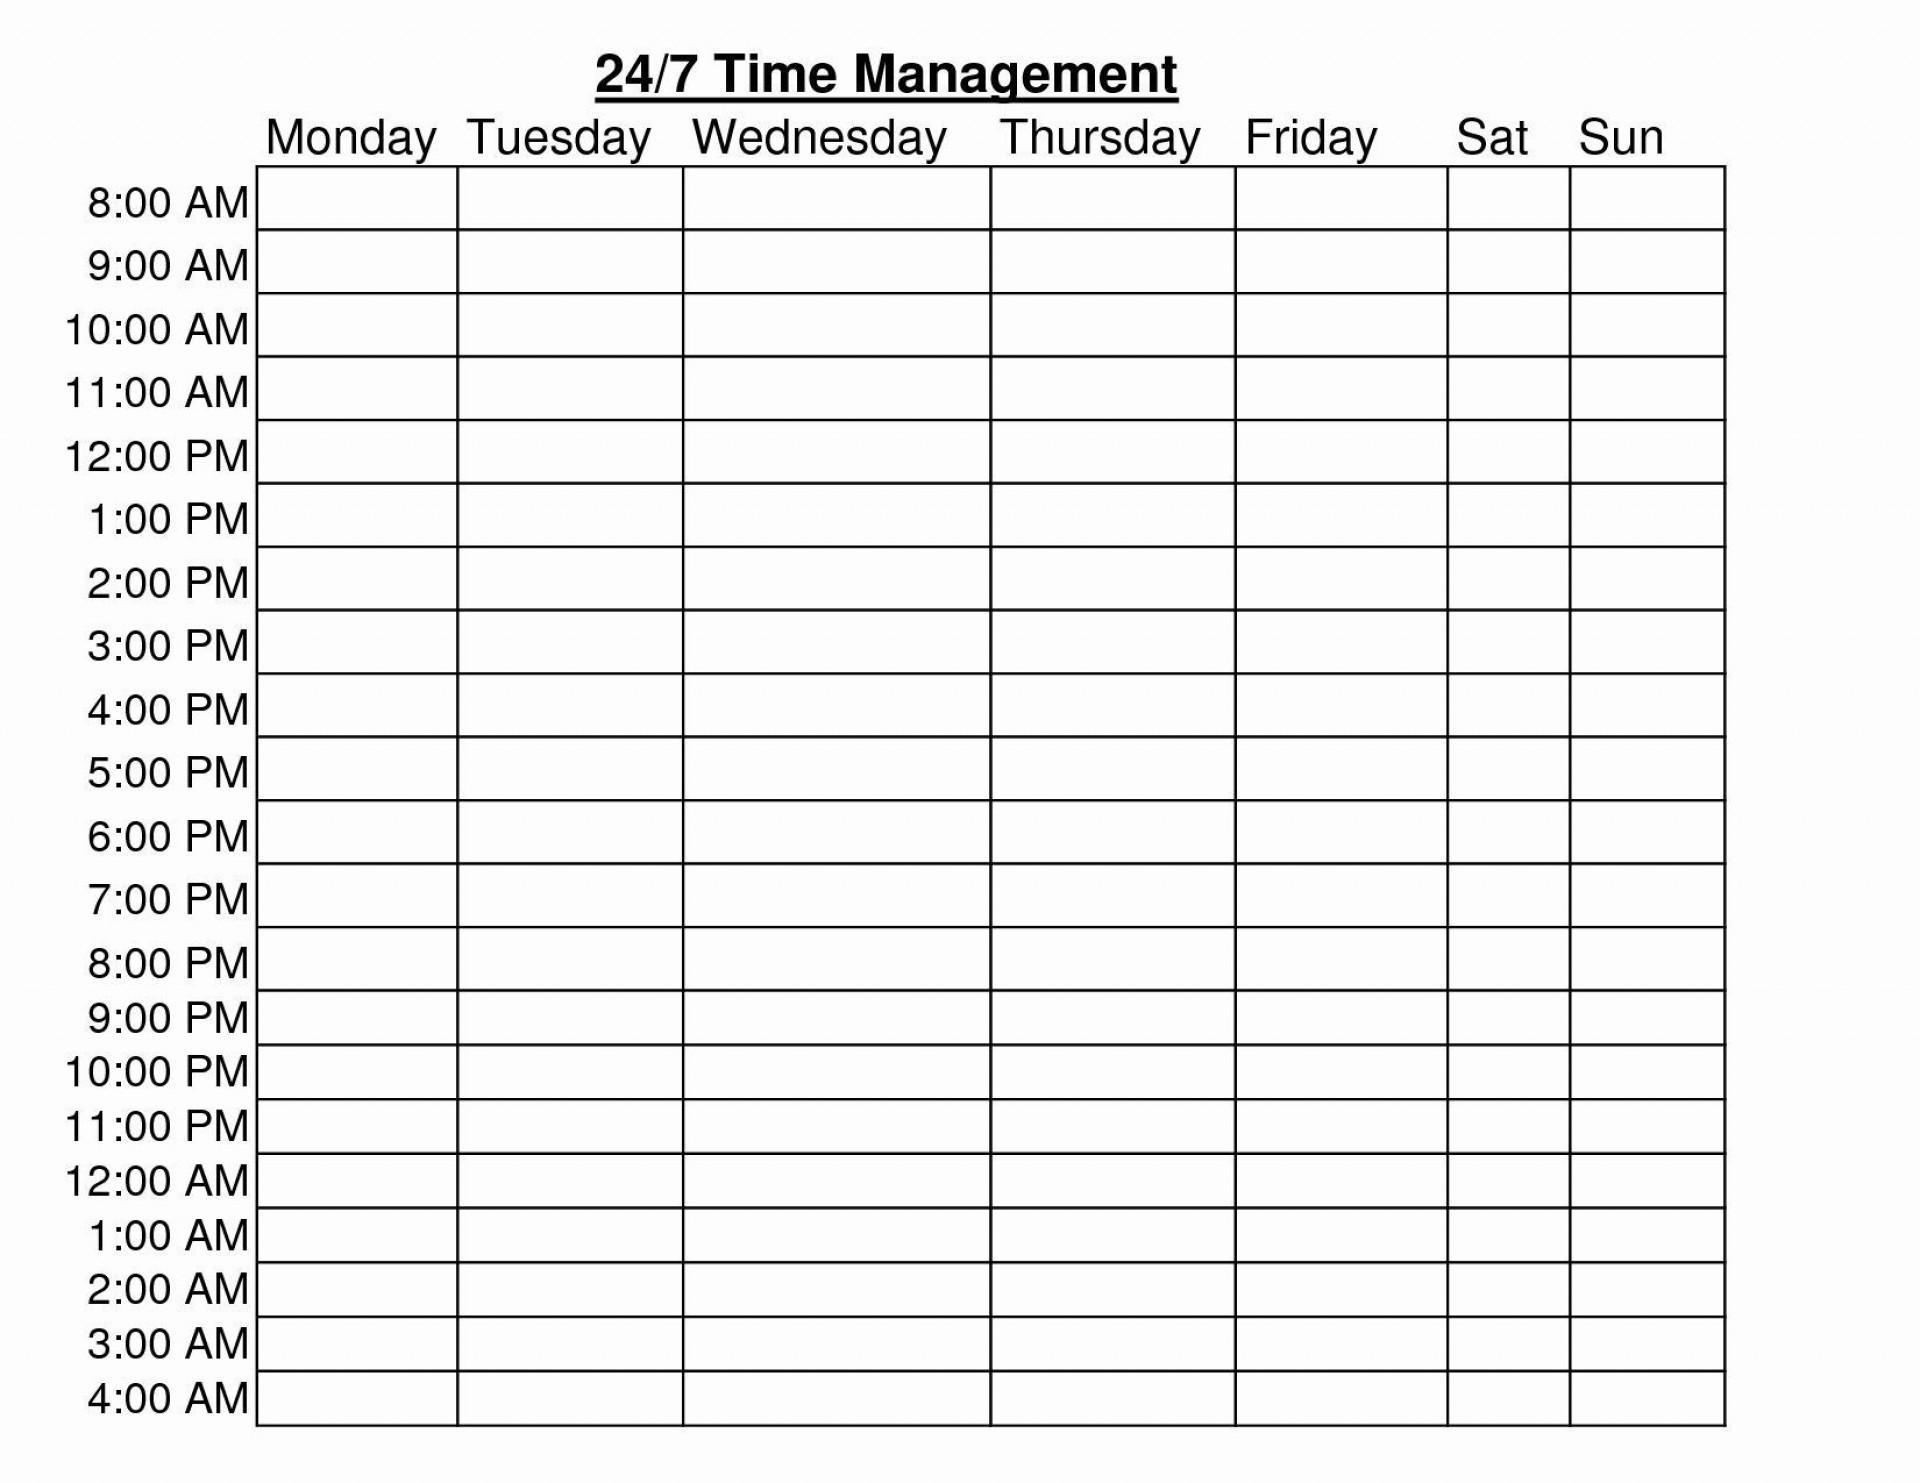 004 Archaicawful 24 Hour Schedule Template Idea  7 Day Work Calendar Word1920